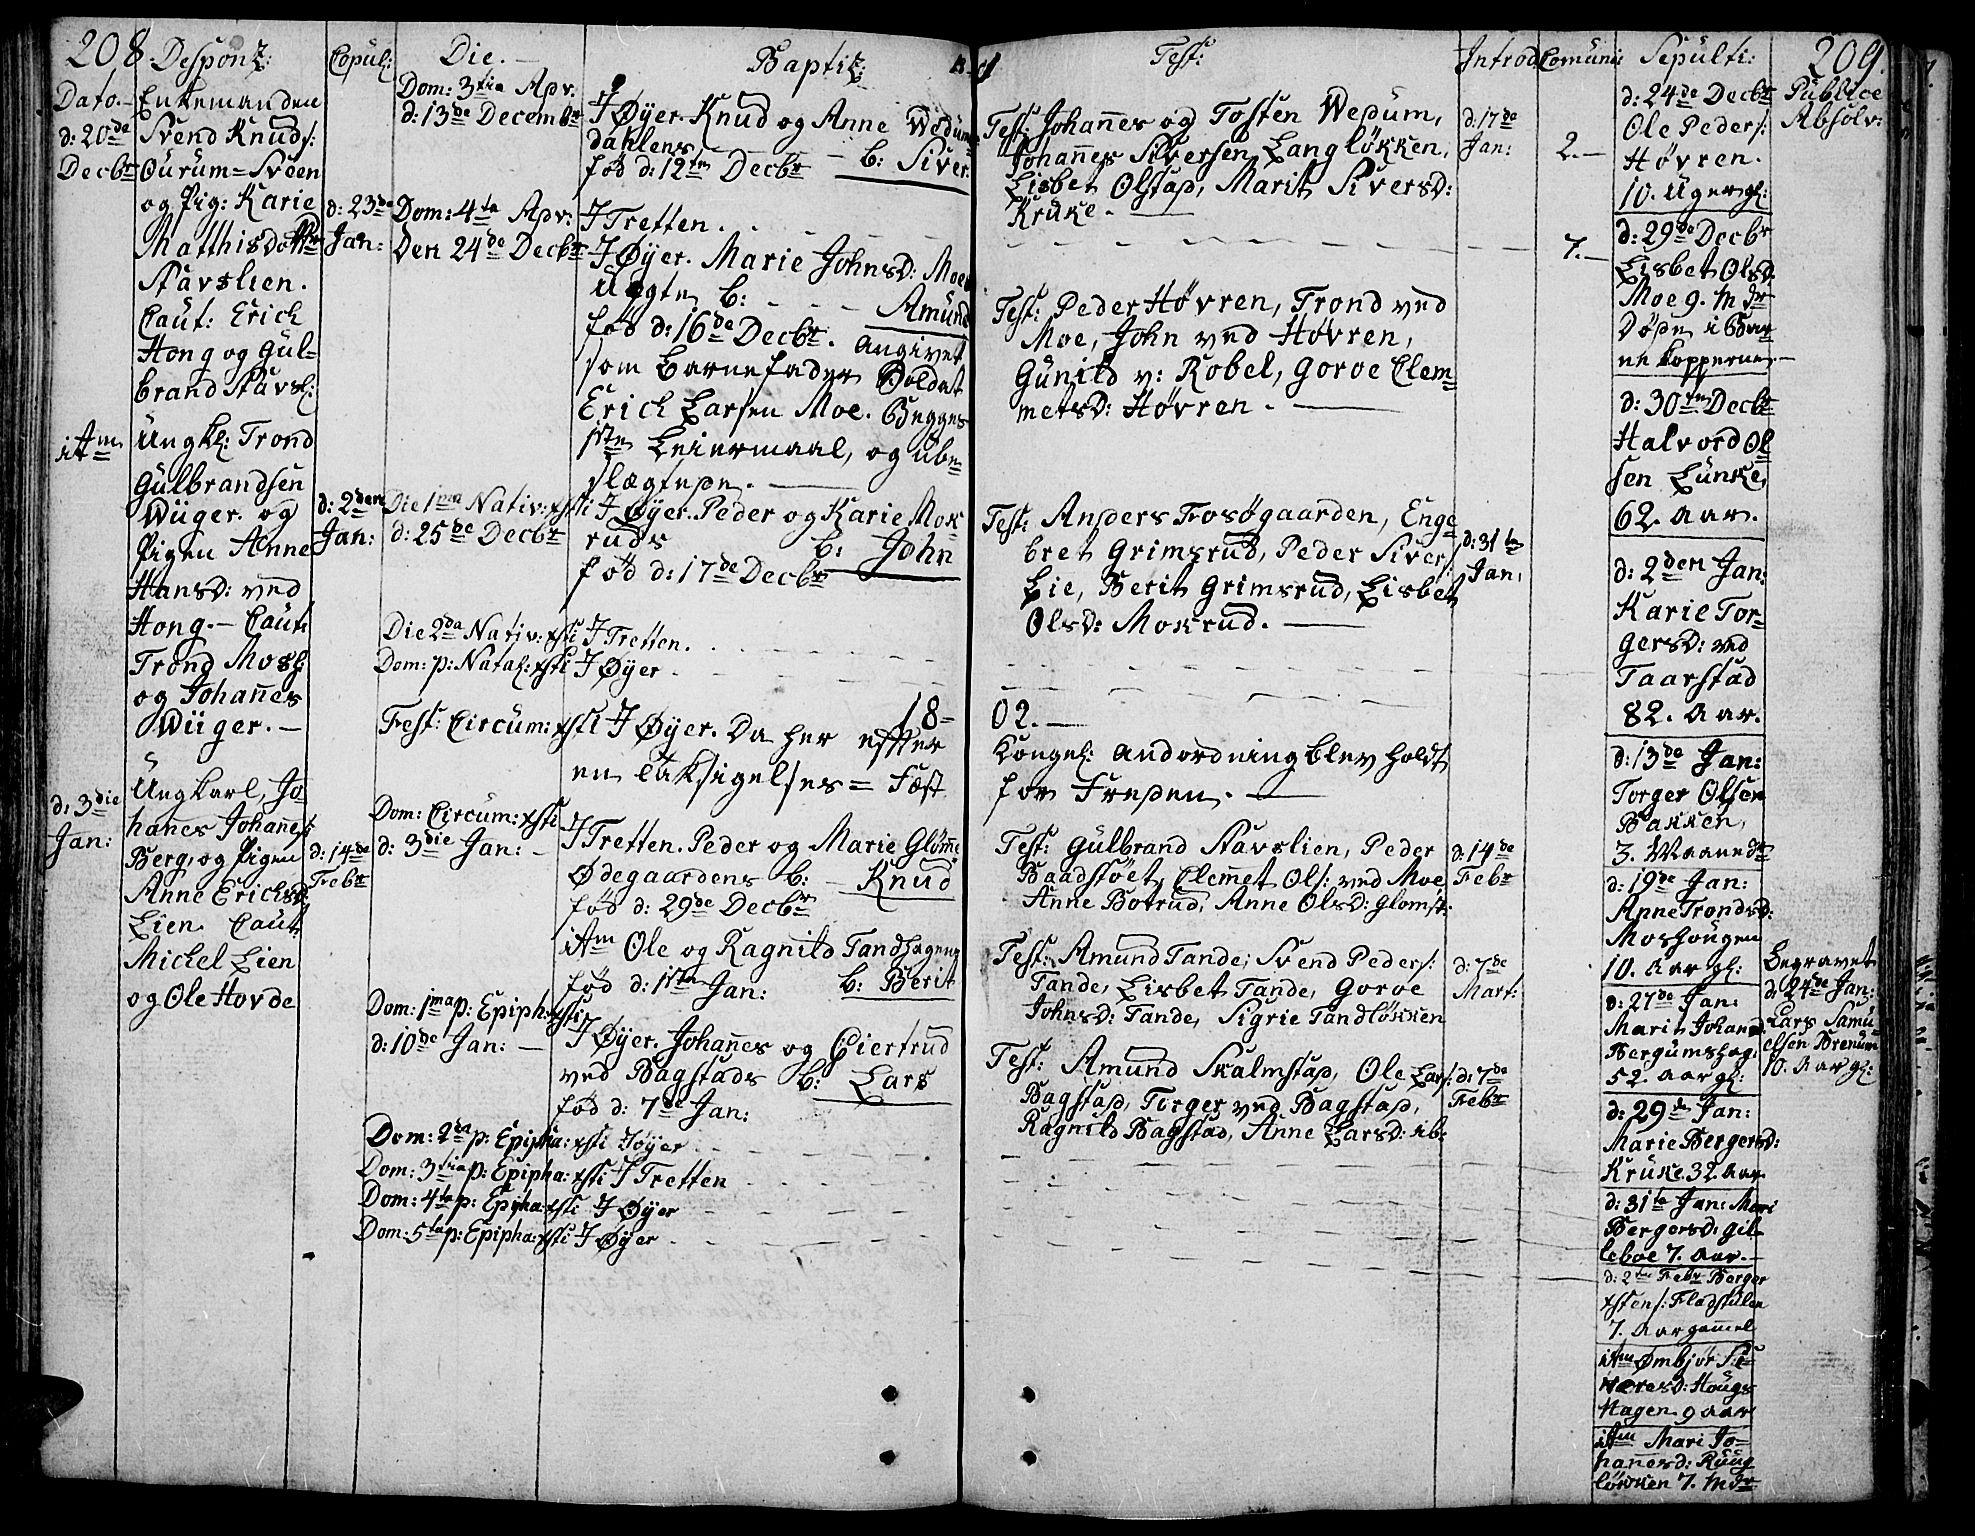 SAH, Øyer prestekontor, Ministerialbok nr. 3, 1784-1824, s. 208-209